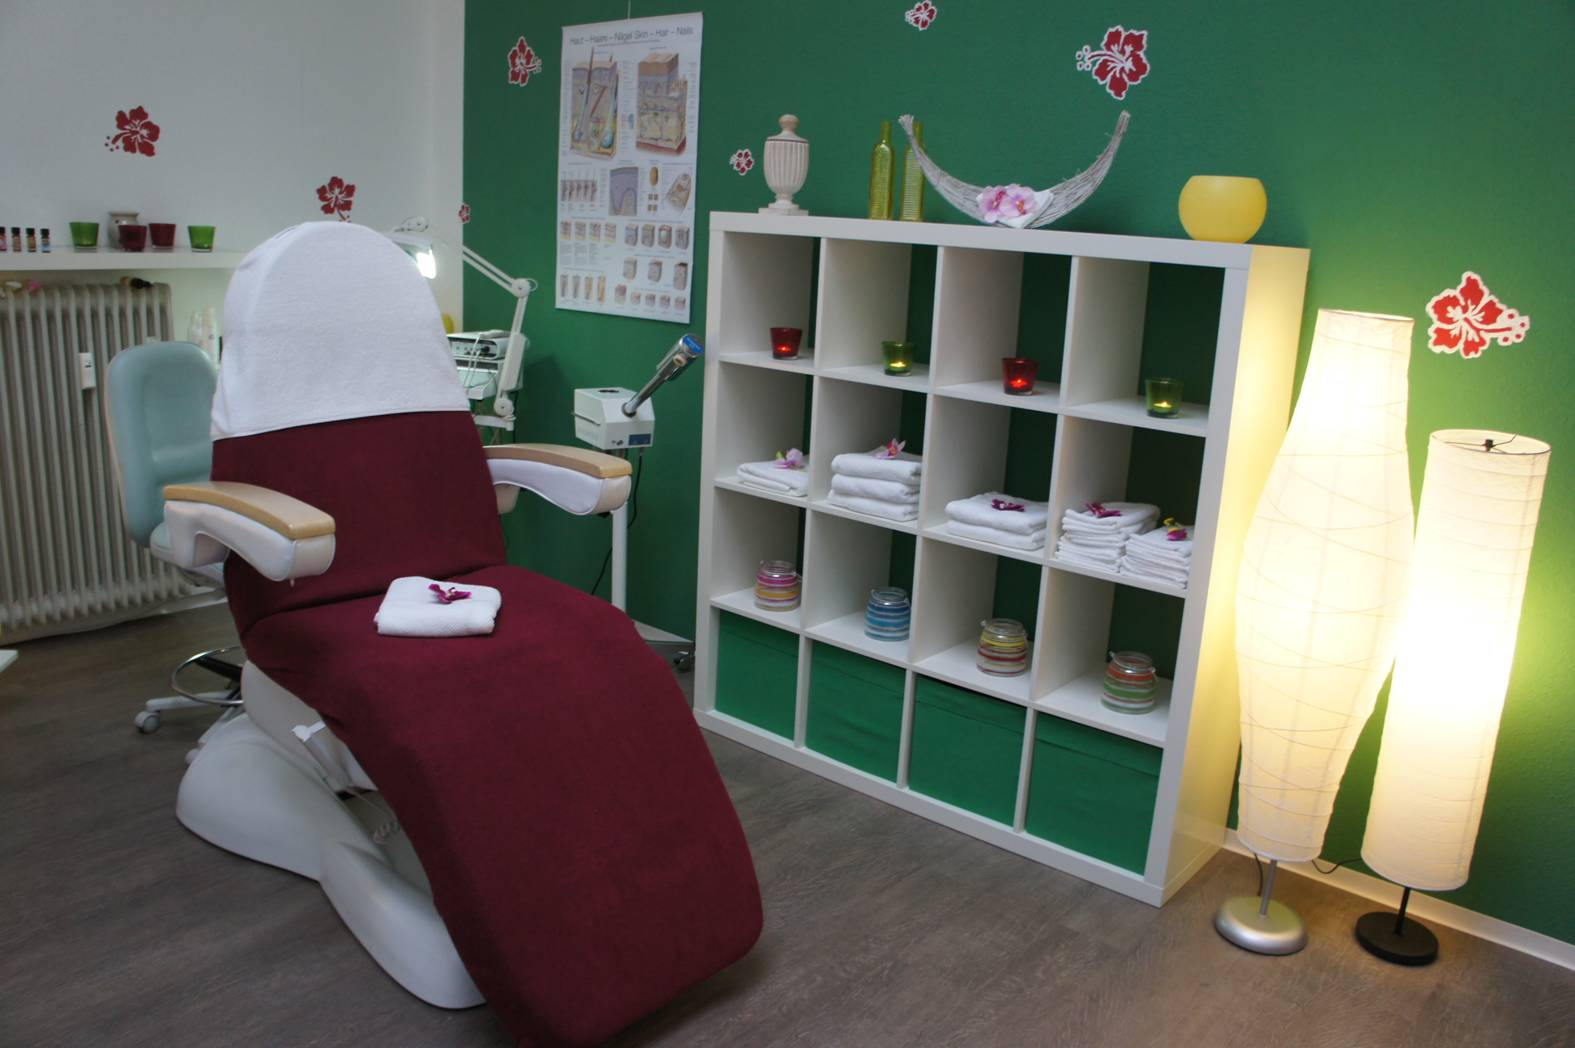 vegan rocks beauty deutschlands erstes veganes kosmethik studio. Black Bedroom Furniture Sets. Home Design Ideas